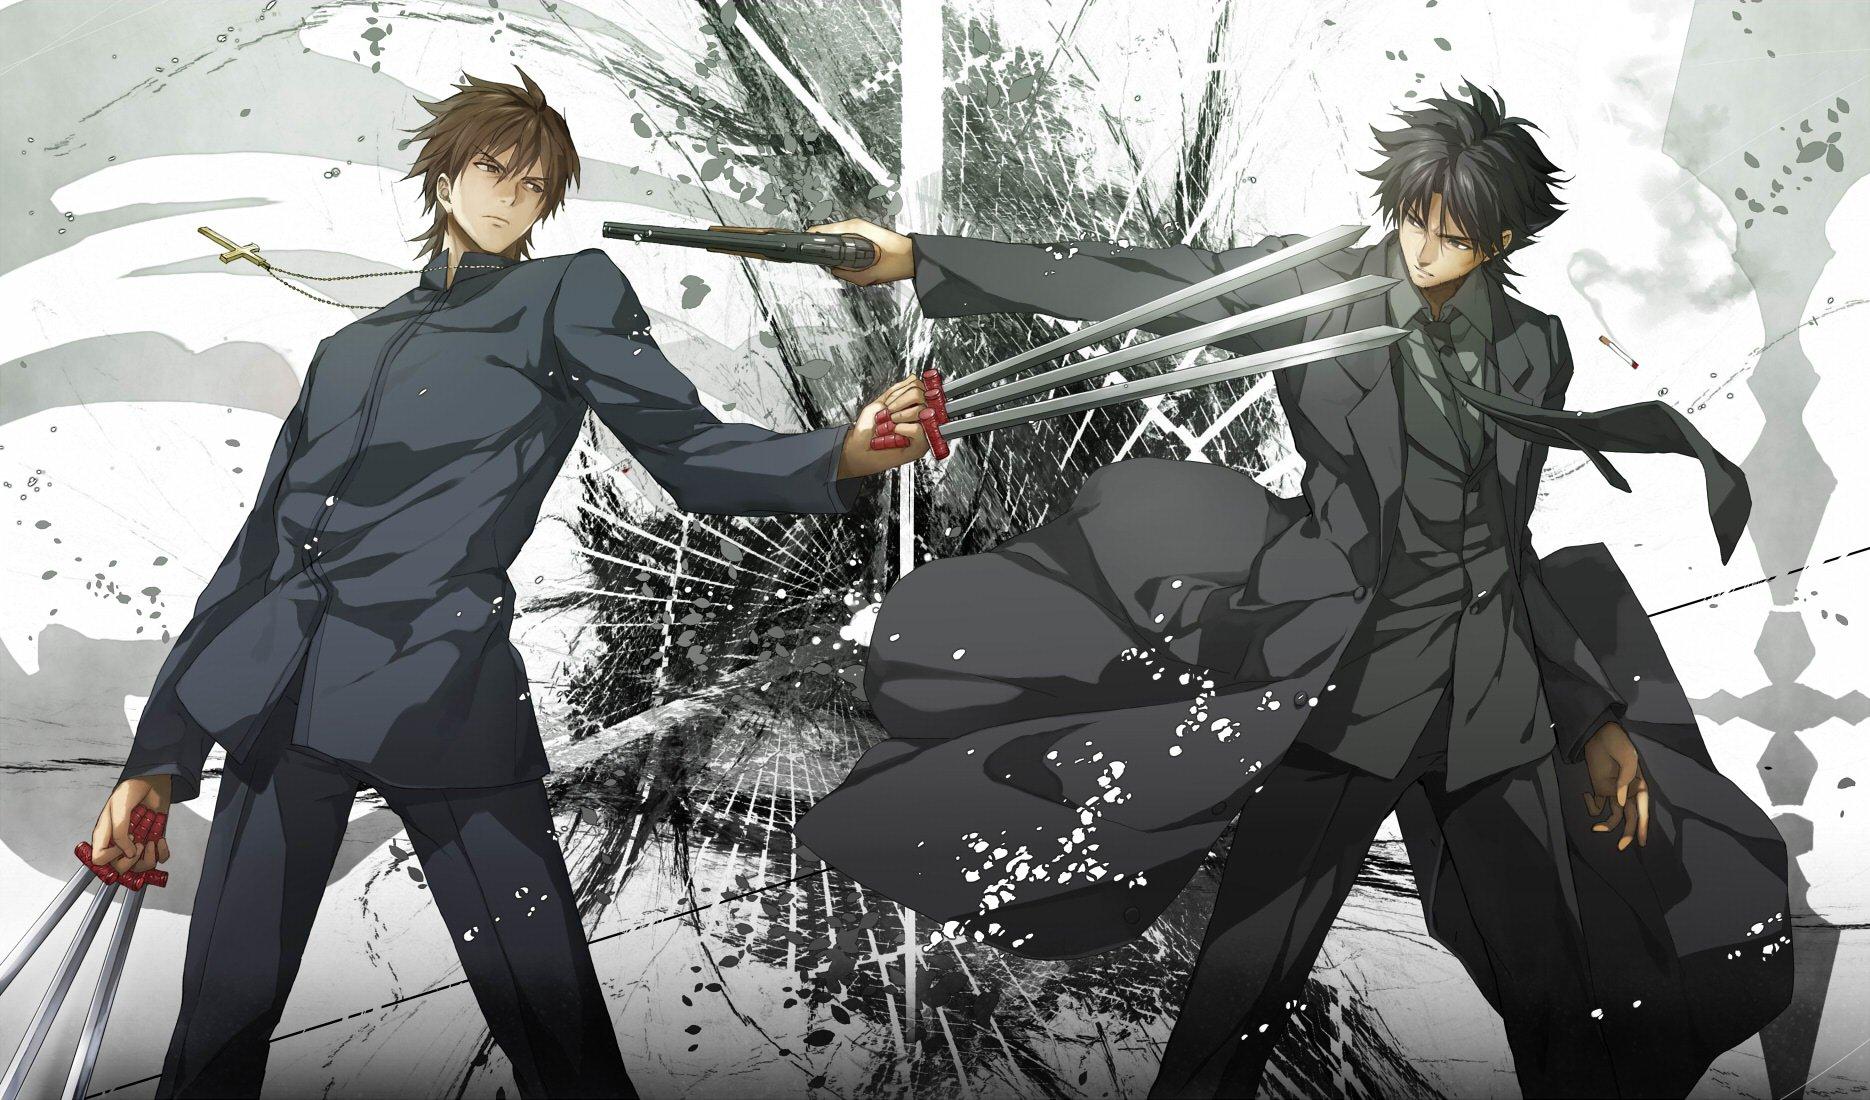 Hd wallpaper anime - Hd Wallpaper Background Id 332414